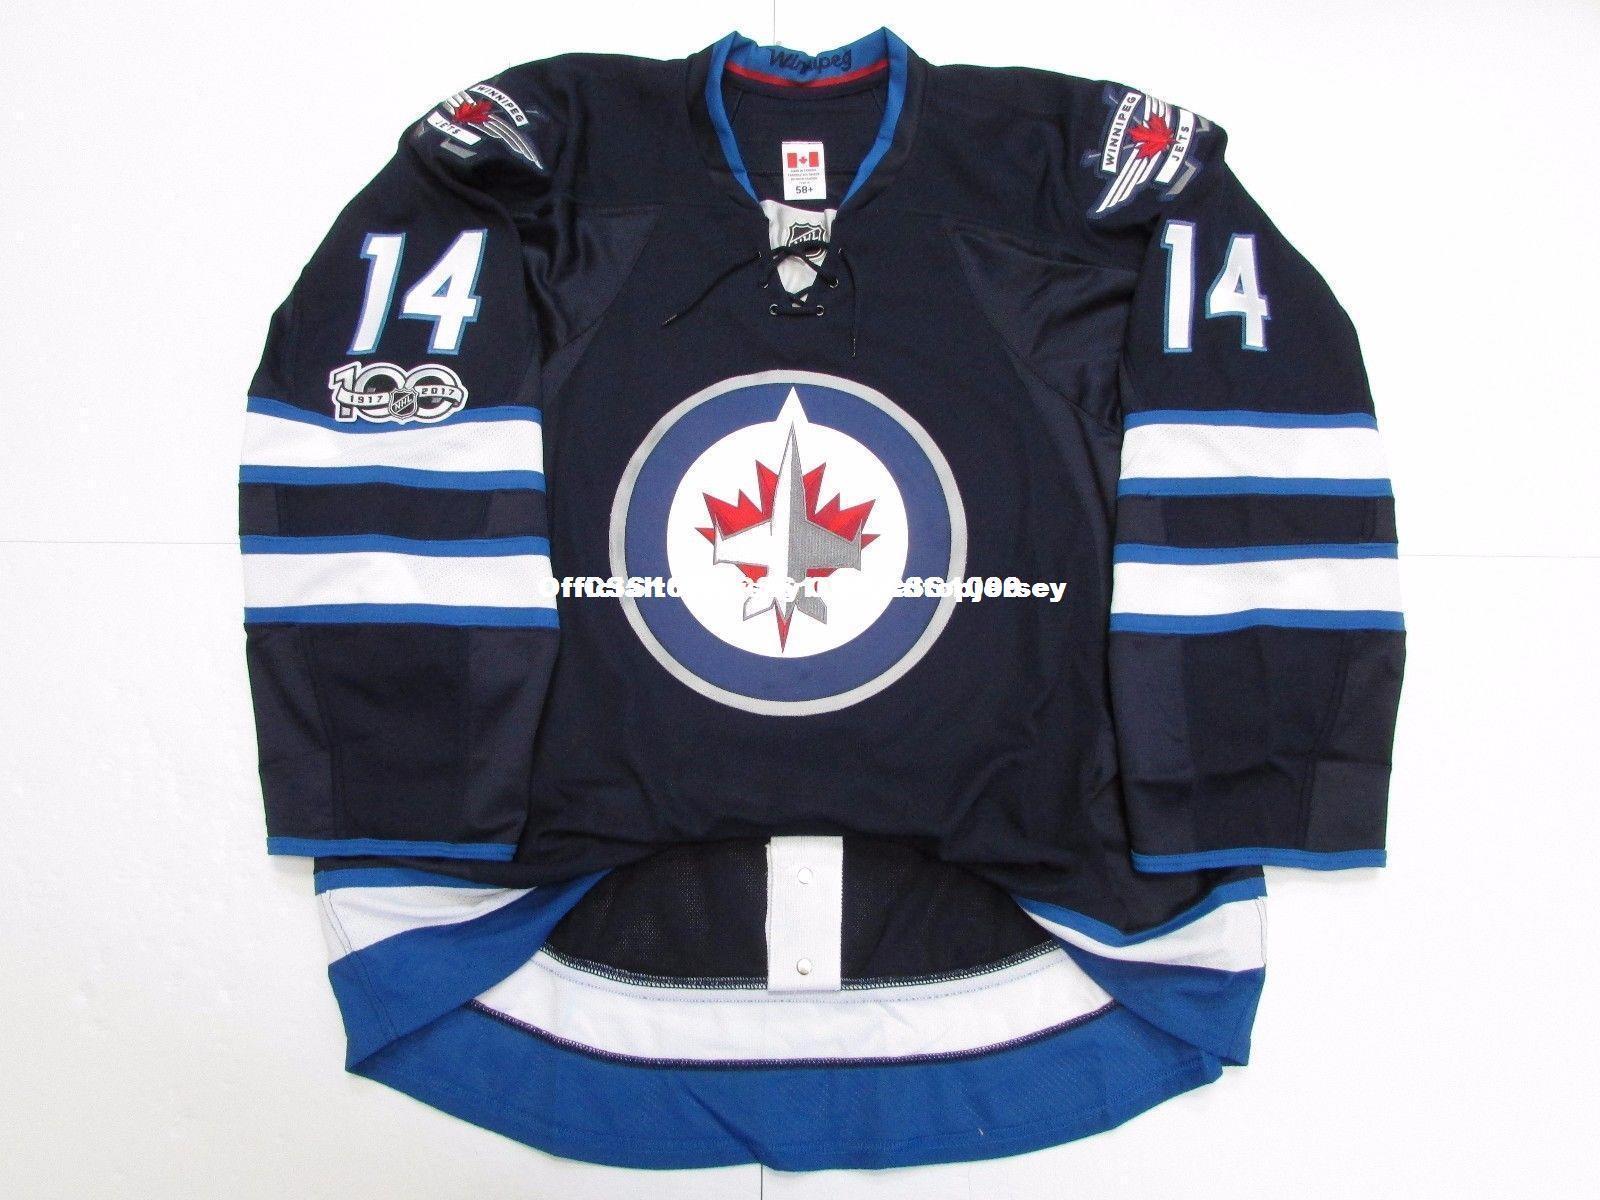 528f378f2 reduced 2019 cheap custom peluso 14 winnipeg jets home 100th anniversary  jersey stitch add any number